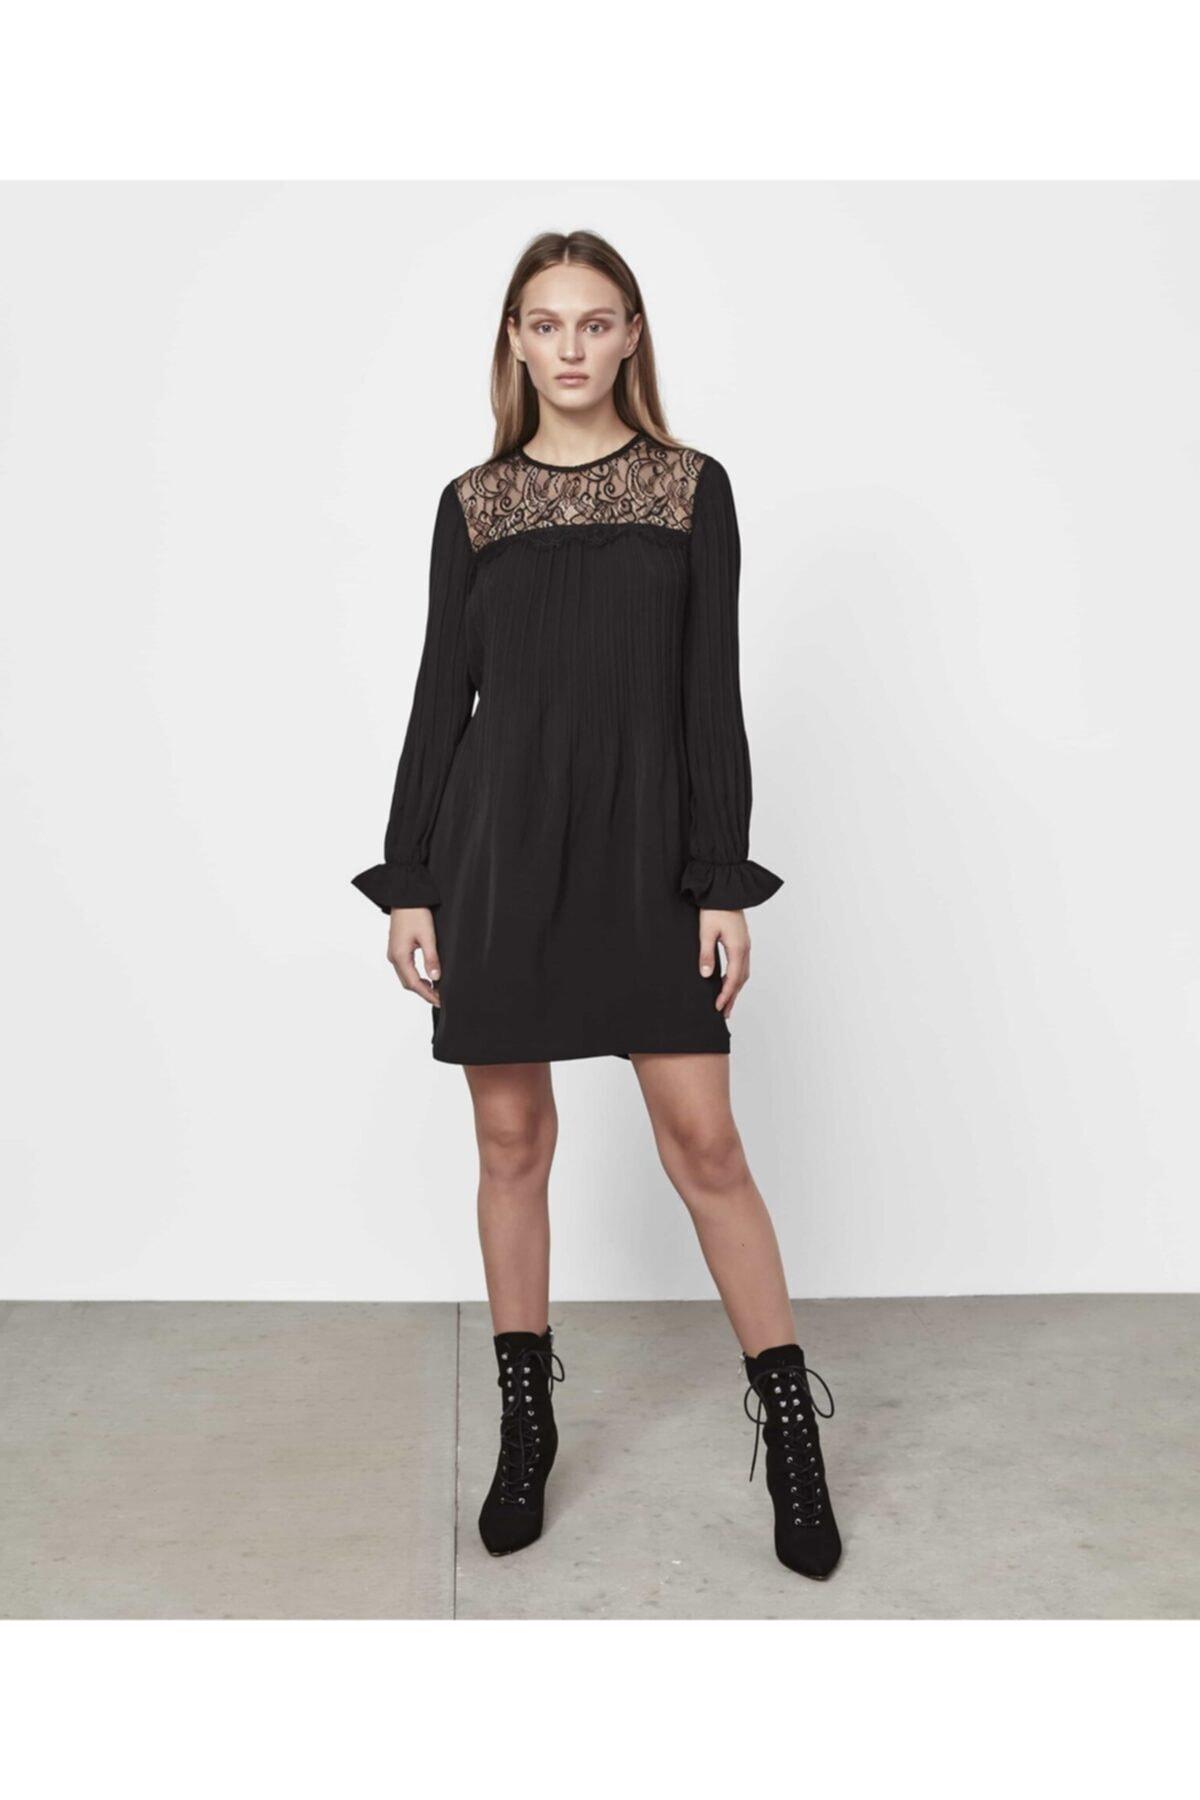 İpekyol Kadın Siyah Dantel Mix Elbise IW6190002458001 1